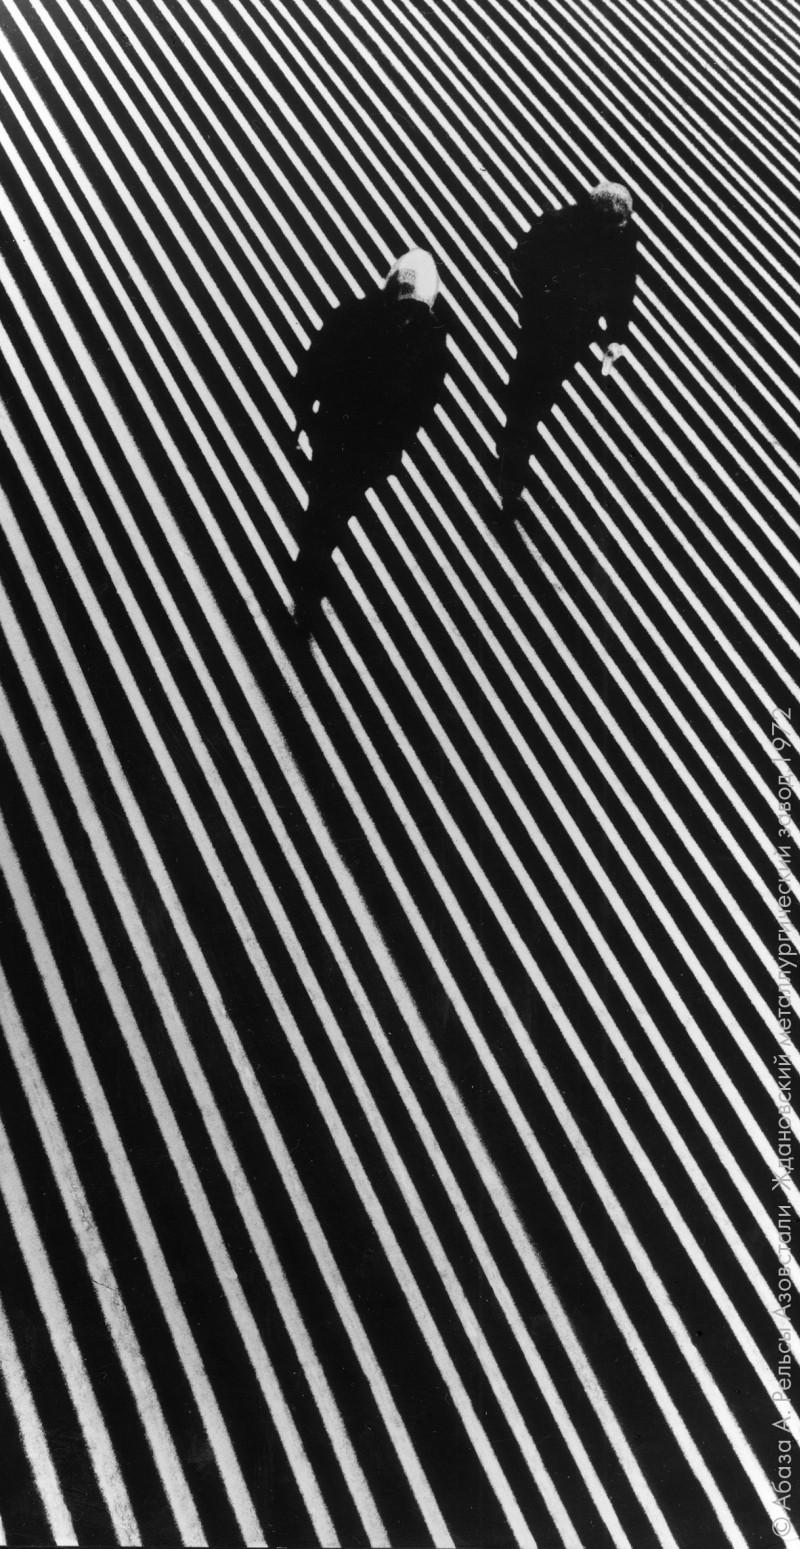 Рельсы Азовстали, 1972 год. Фотограф: Александр Абаза.